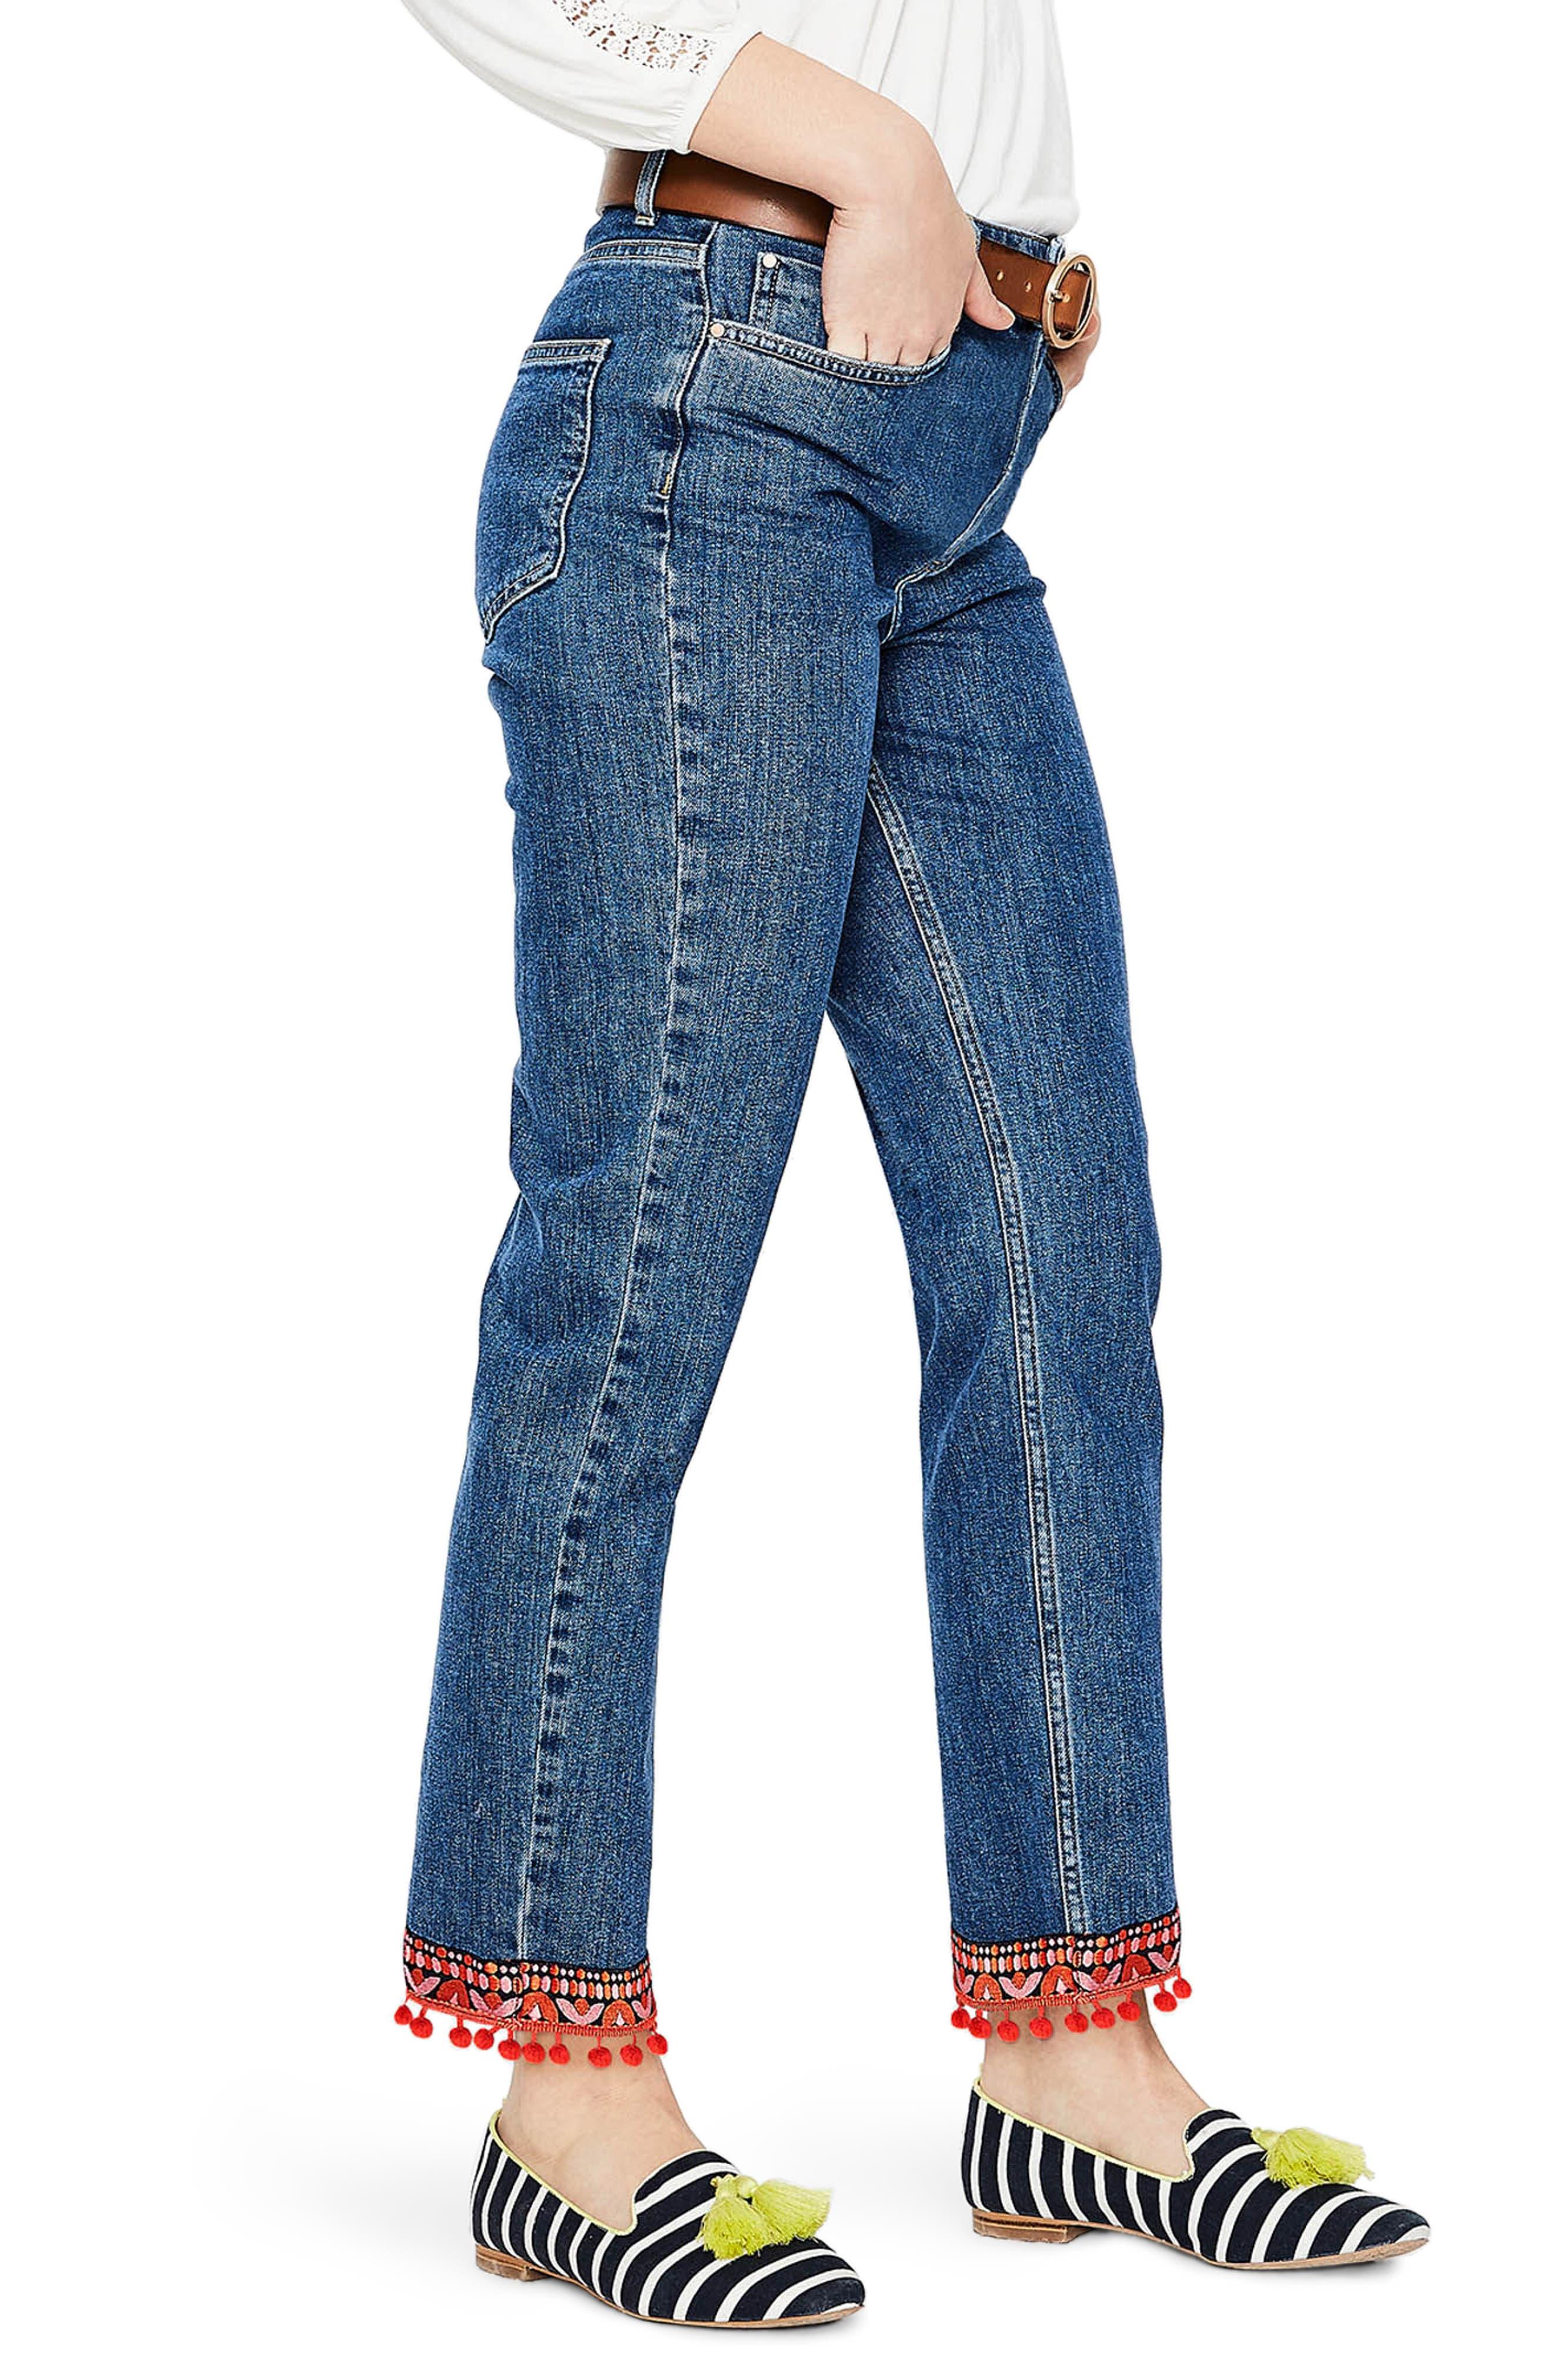 Cambridge Embellished Ankle Skimmer Jeans,                             Alternate thumbnail 3, color,                             Mid Vintage With Tri